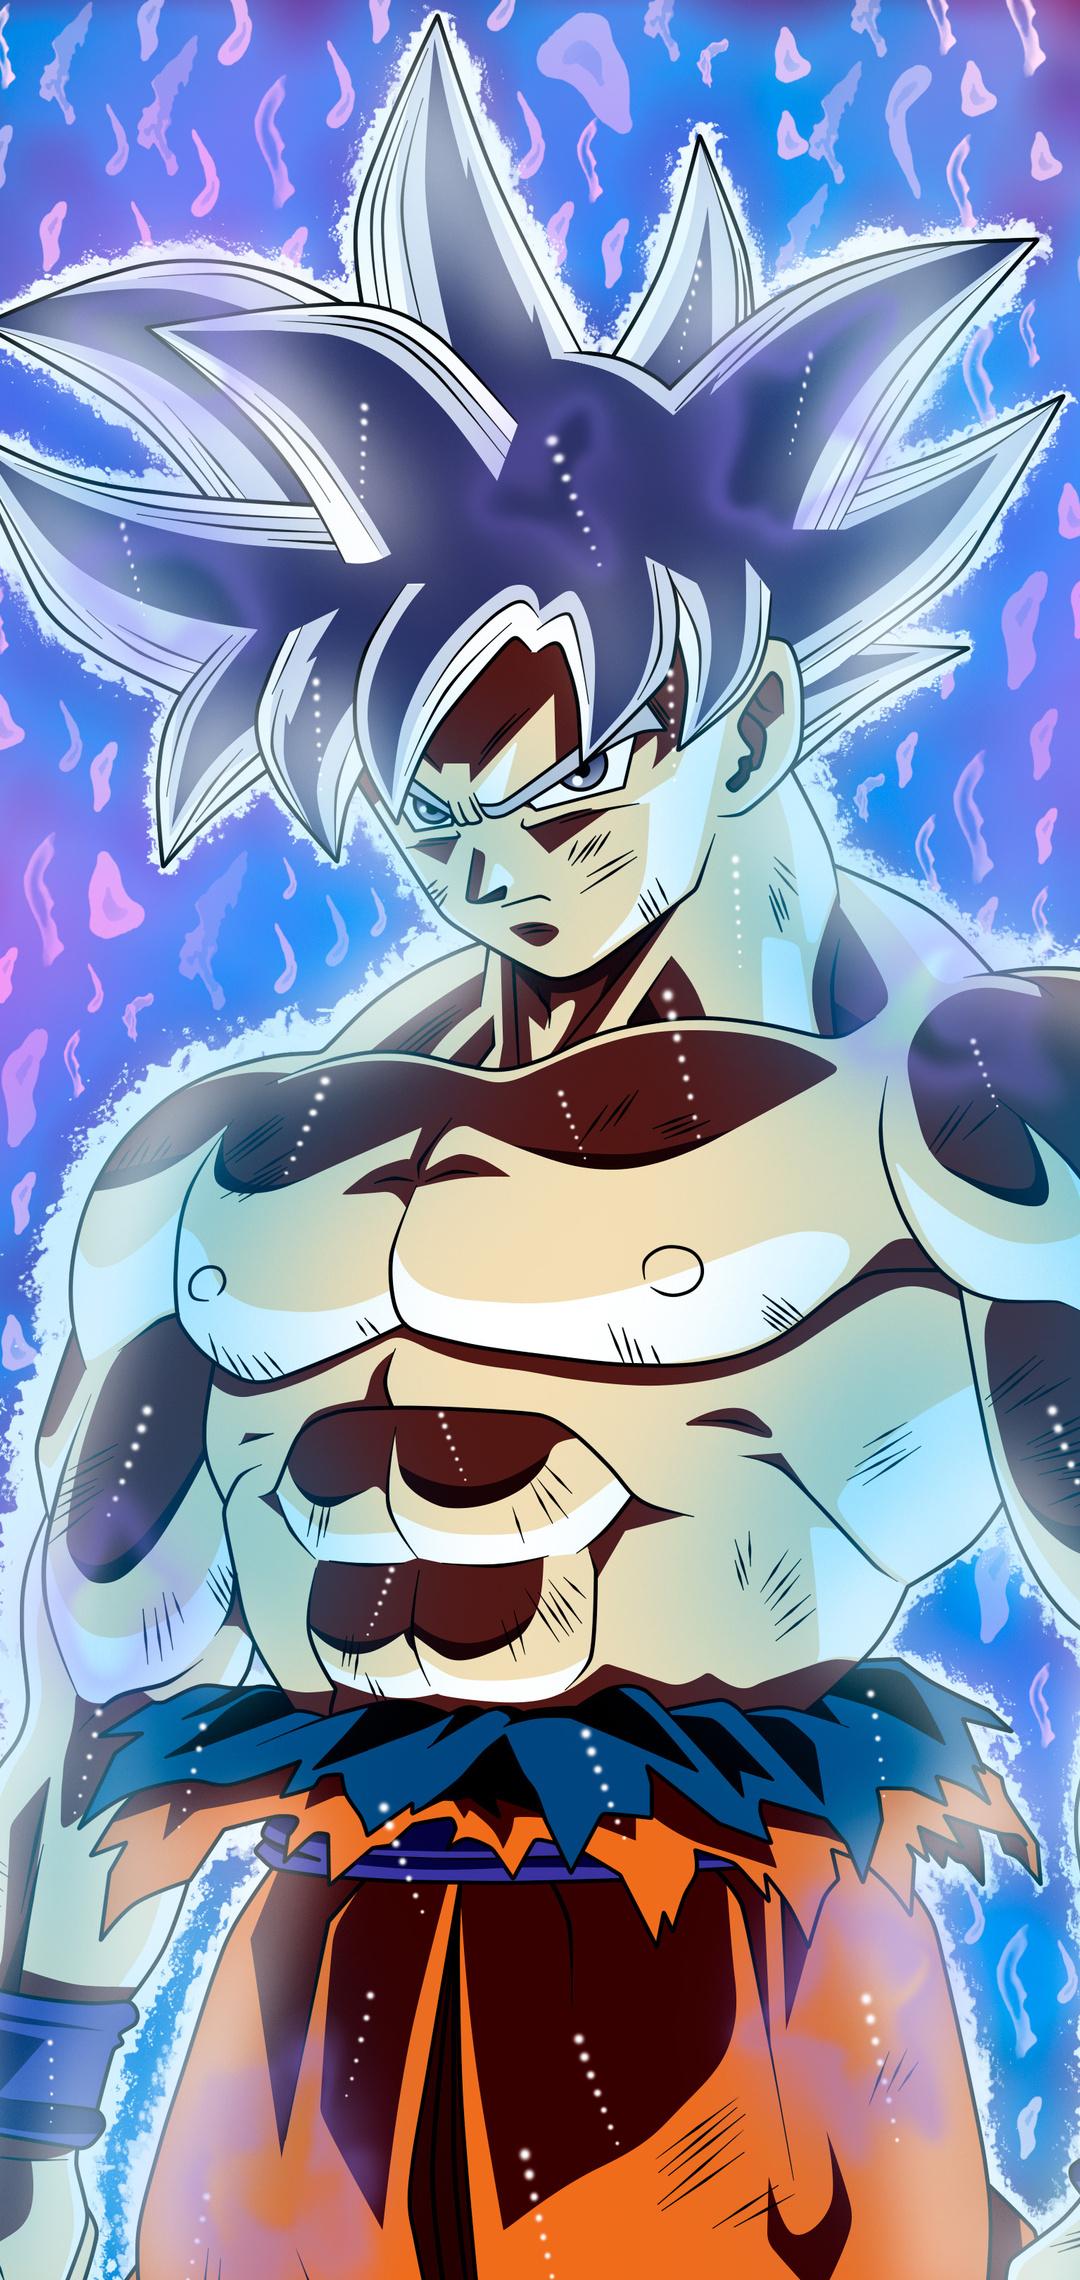 goku-migatte-no-gokui-perfecto-ultra-instinct-dragon-ball-wr.jpg